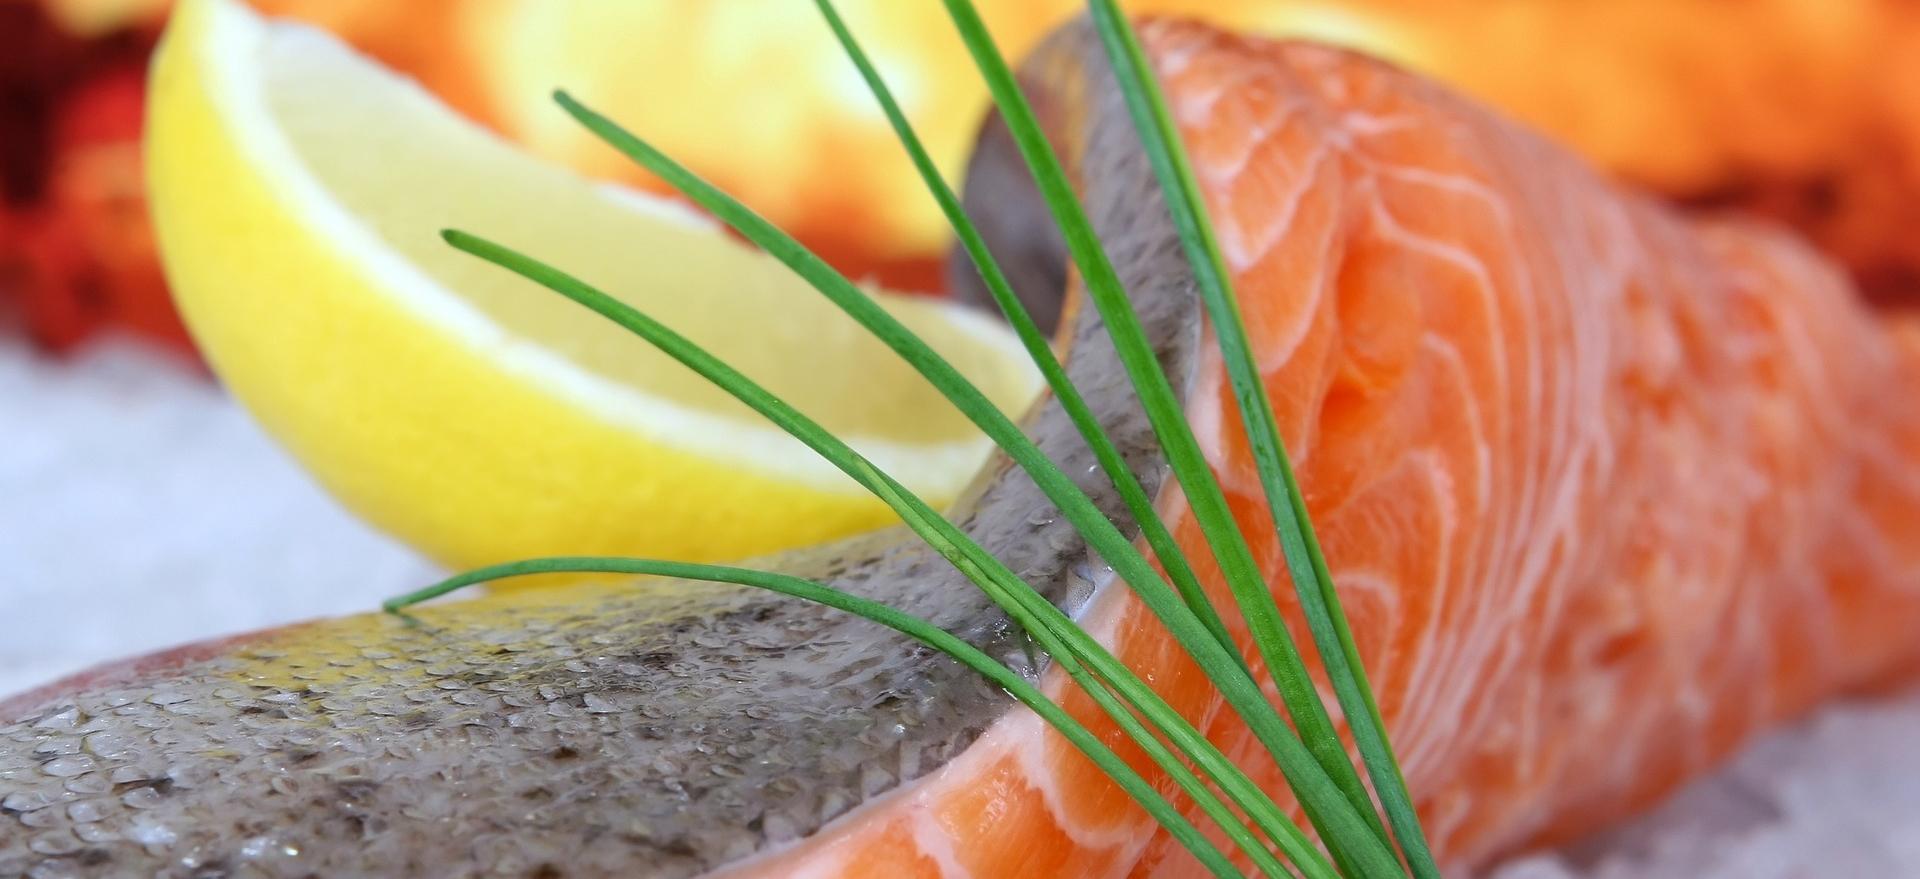 salmon-1238667_1920.jpg